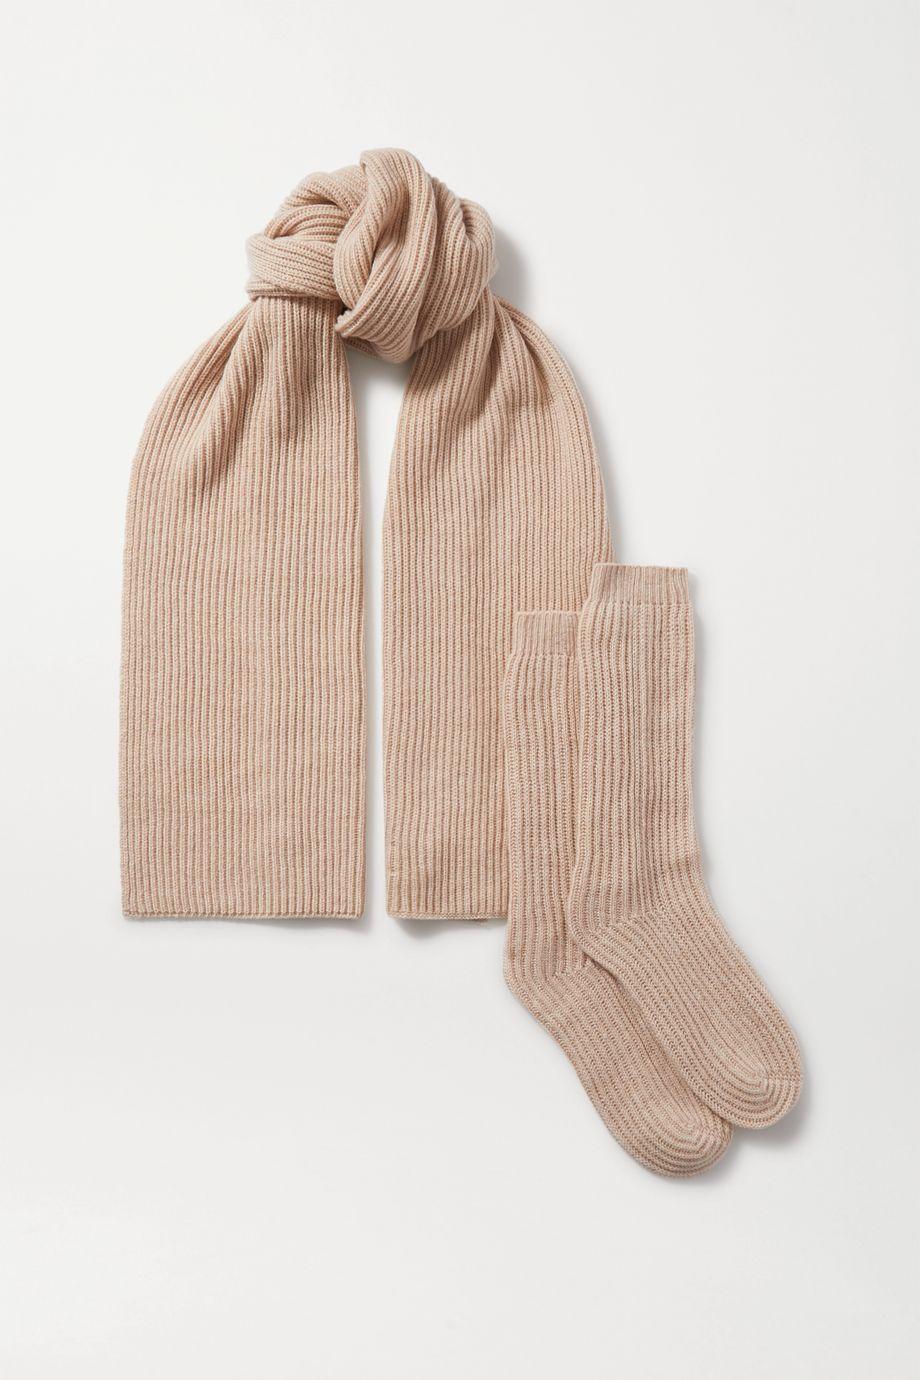 Johnstons of Elgin Ribbed cashmere scarf and socks set